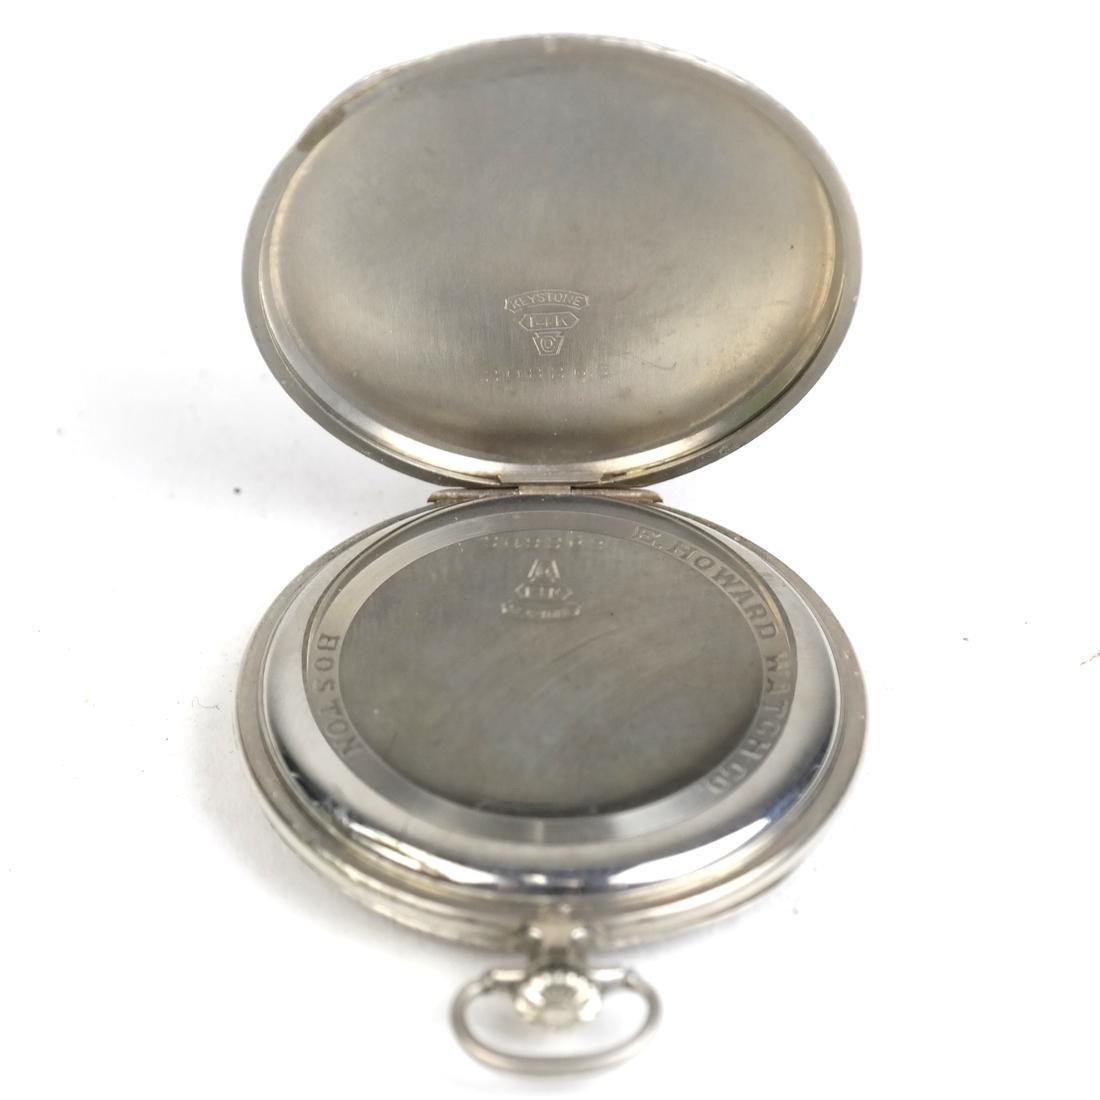 E. Howard & Co, 14k Pocket Watch - 4